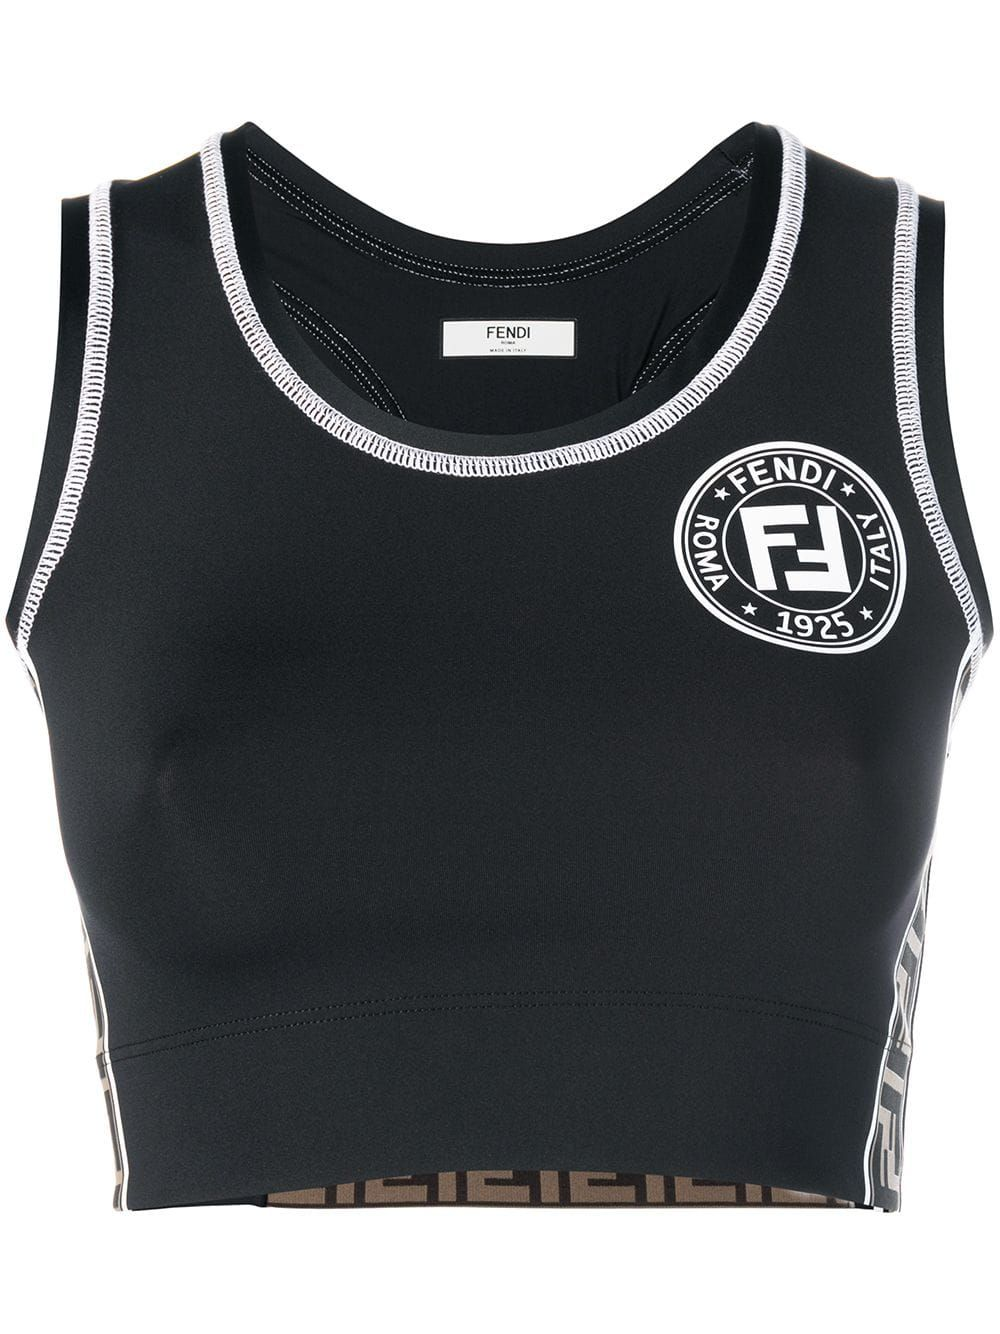 FENDI Black Sporty top. fendi cloth in 2019 Black